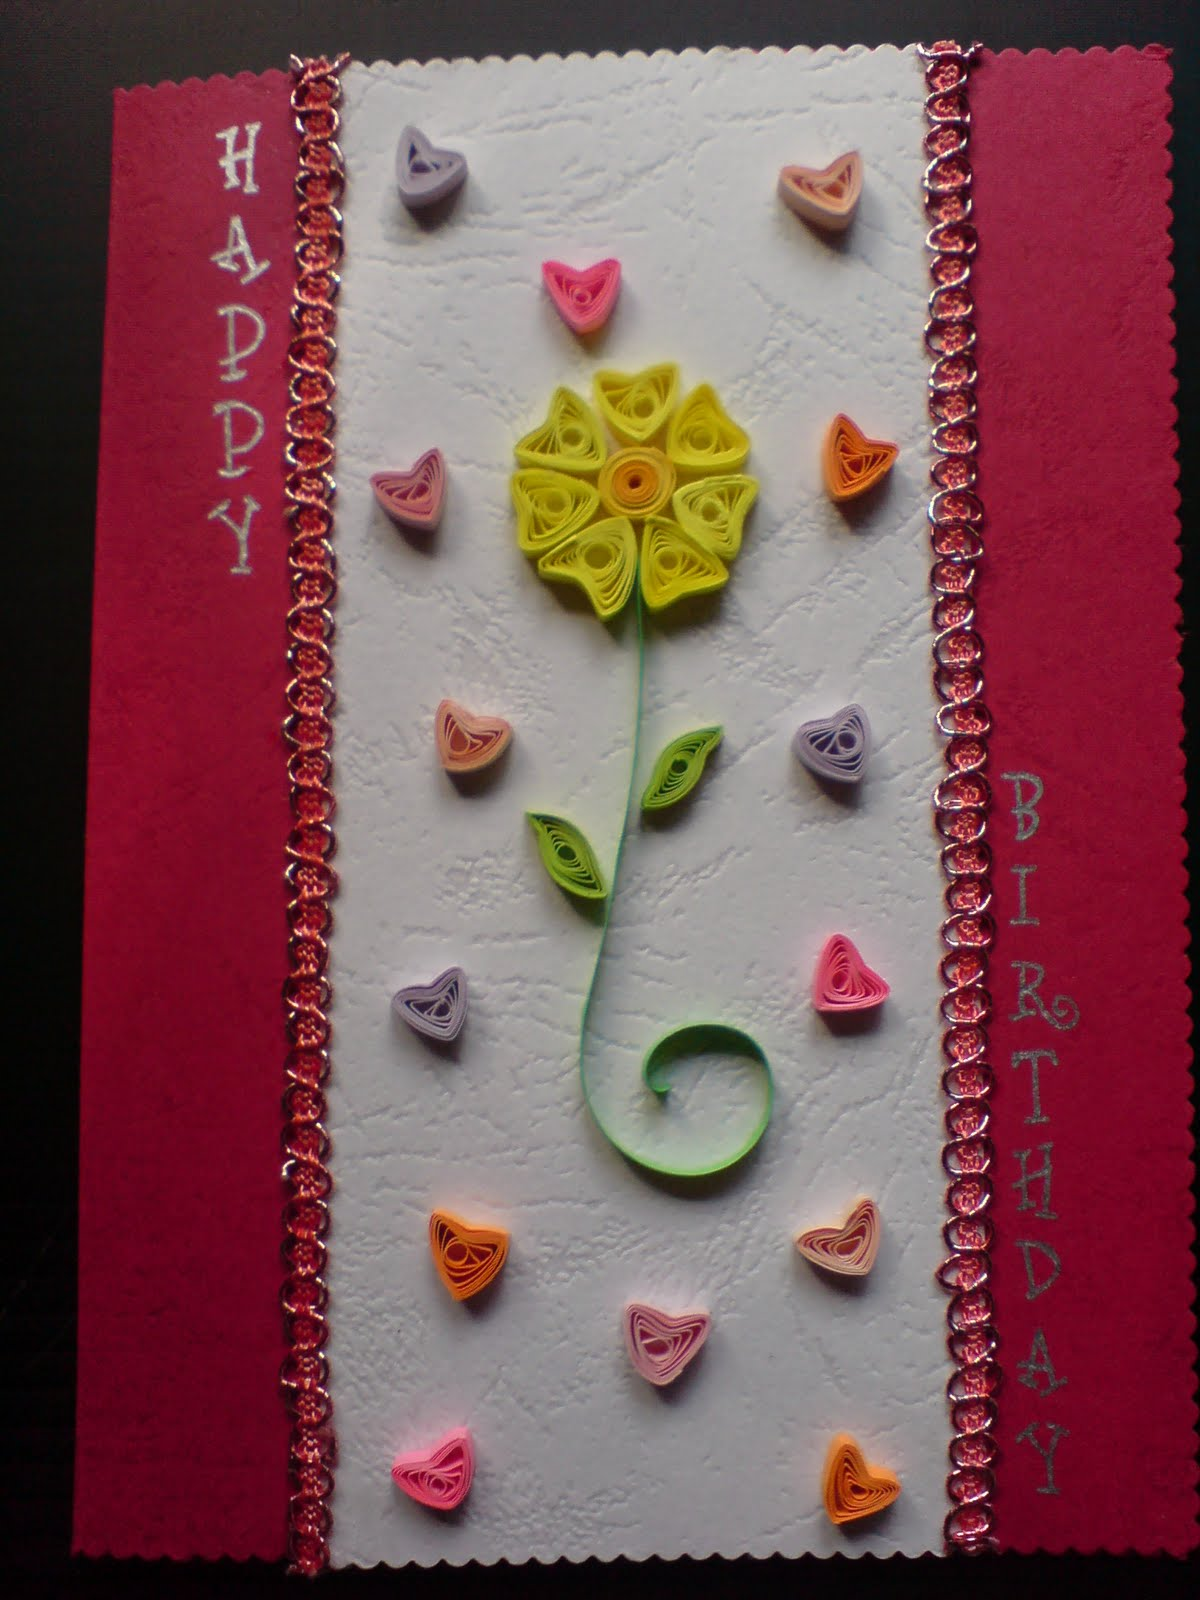 Chami Crafts  Handmade Greeting Cards: Hearts Birthday Card